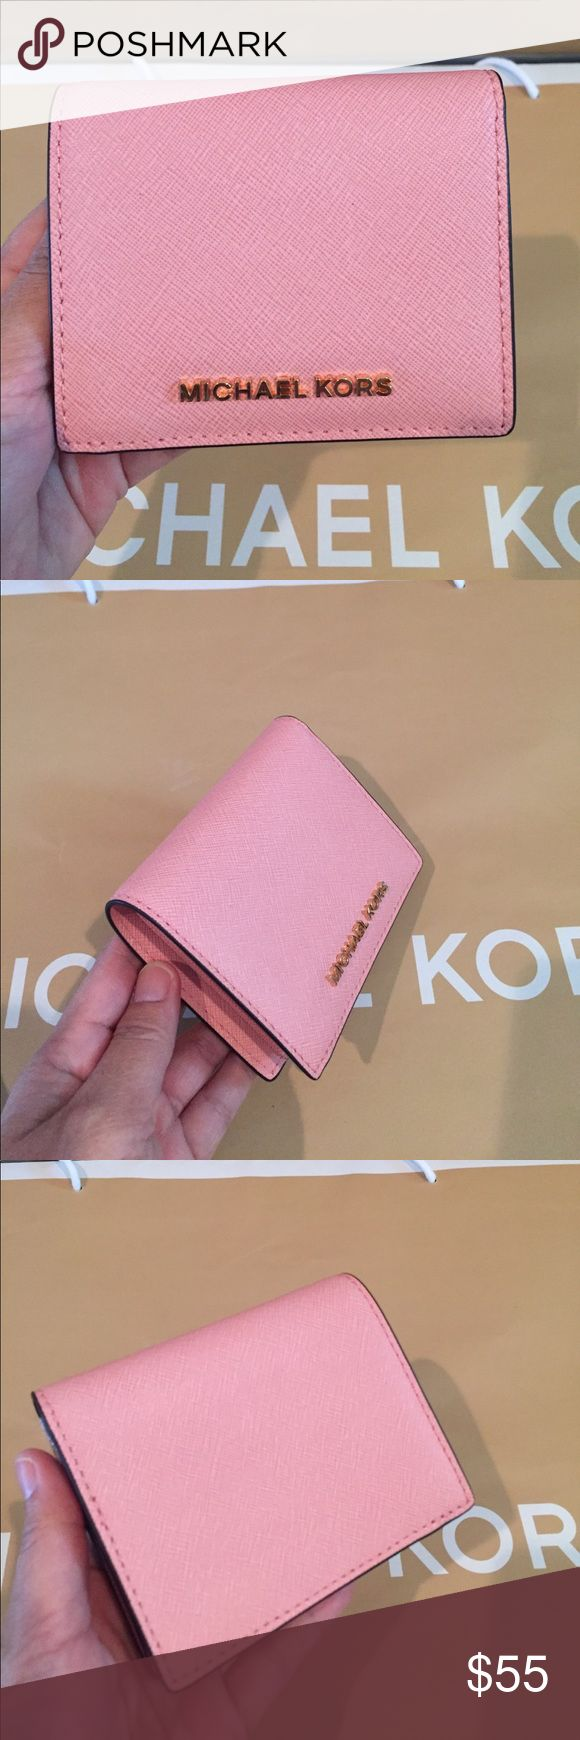 🌷Michael Kors Jet Set Travel Pale pink🌷 100% Authentic Michael Kors Jet Set Travel Flap Card Holder Leather 🌷🌸PalePink🌸🌷 Michael Kors Bags Wallets